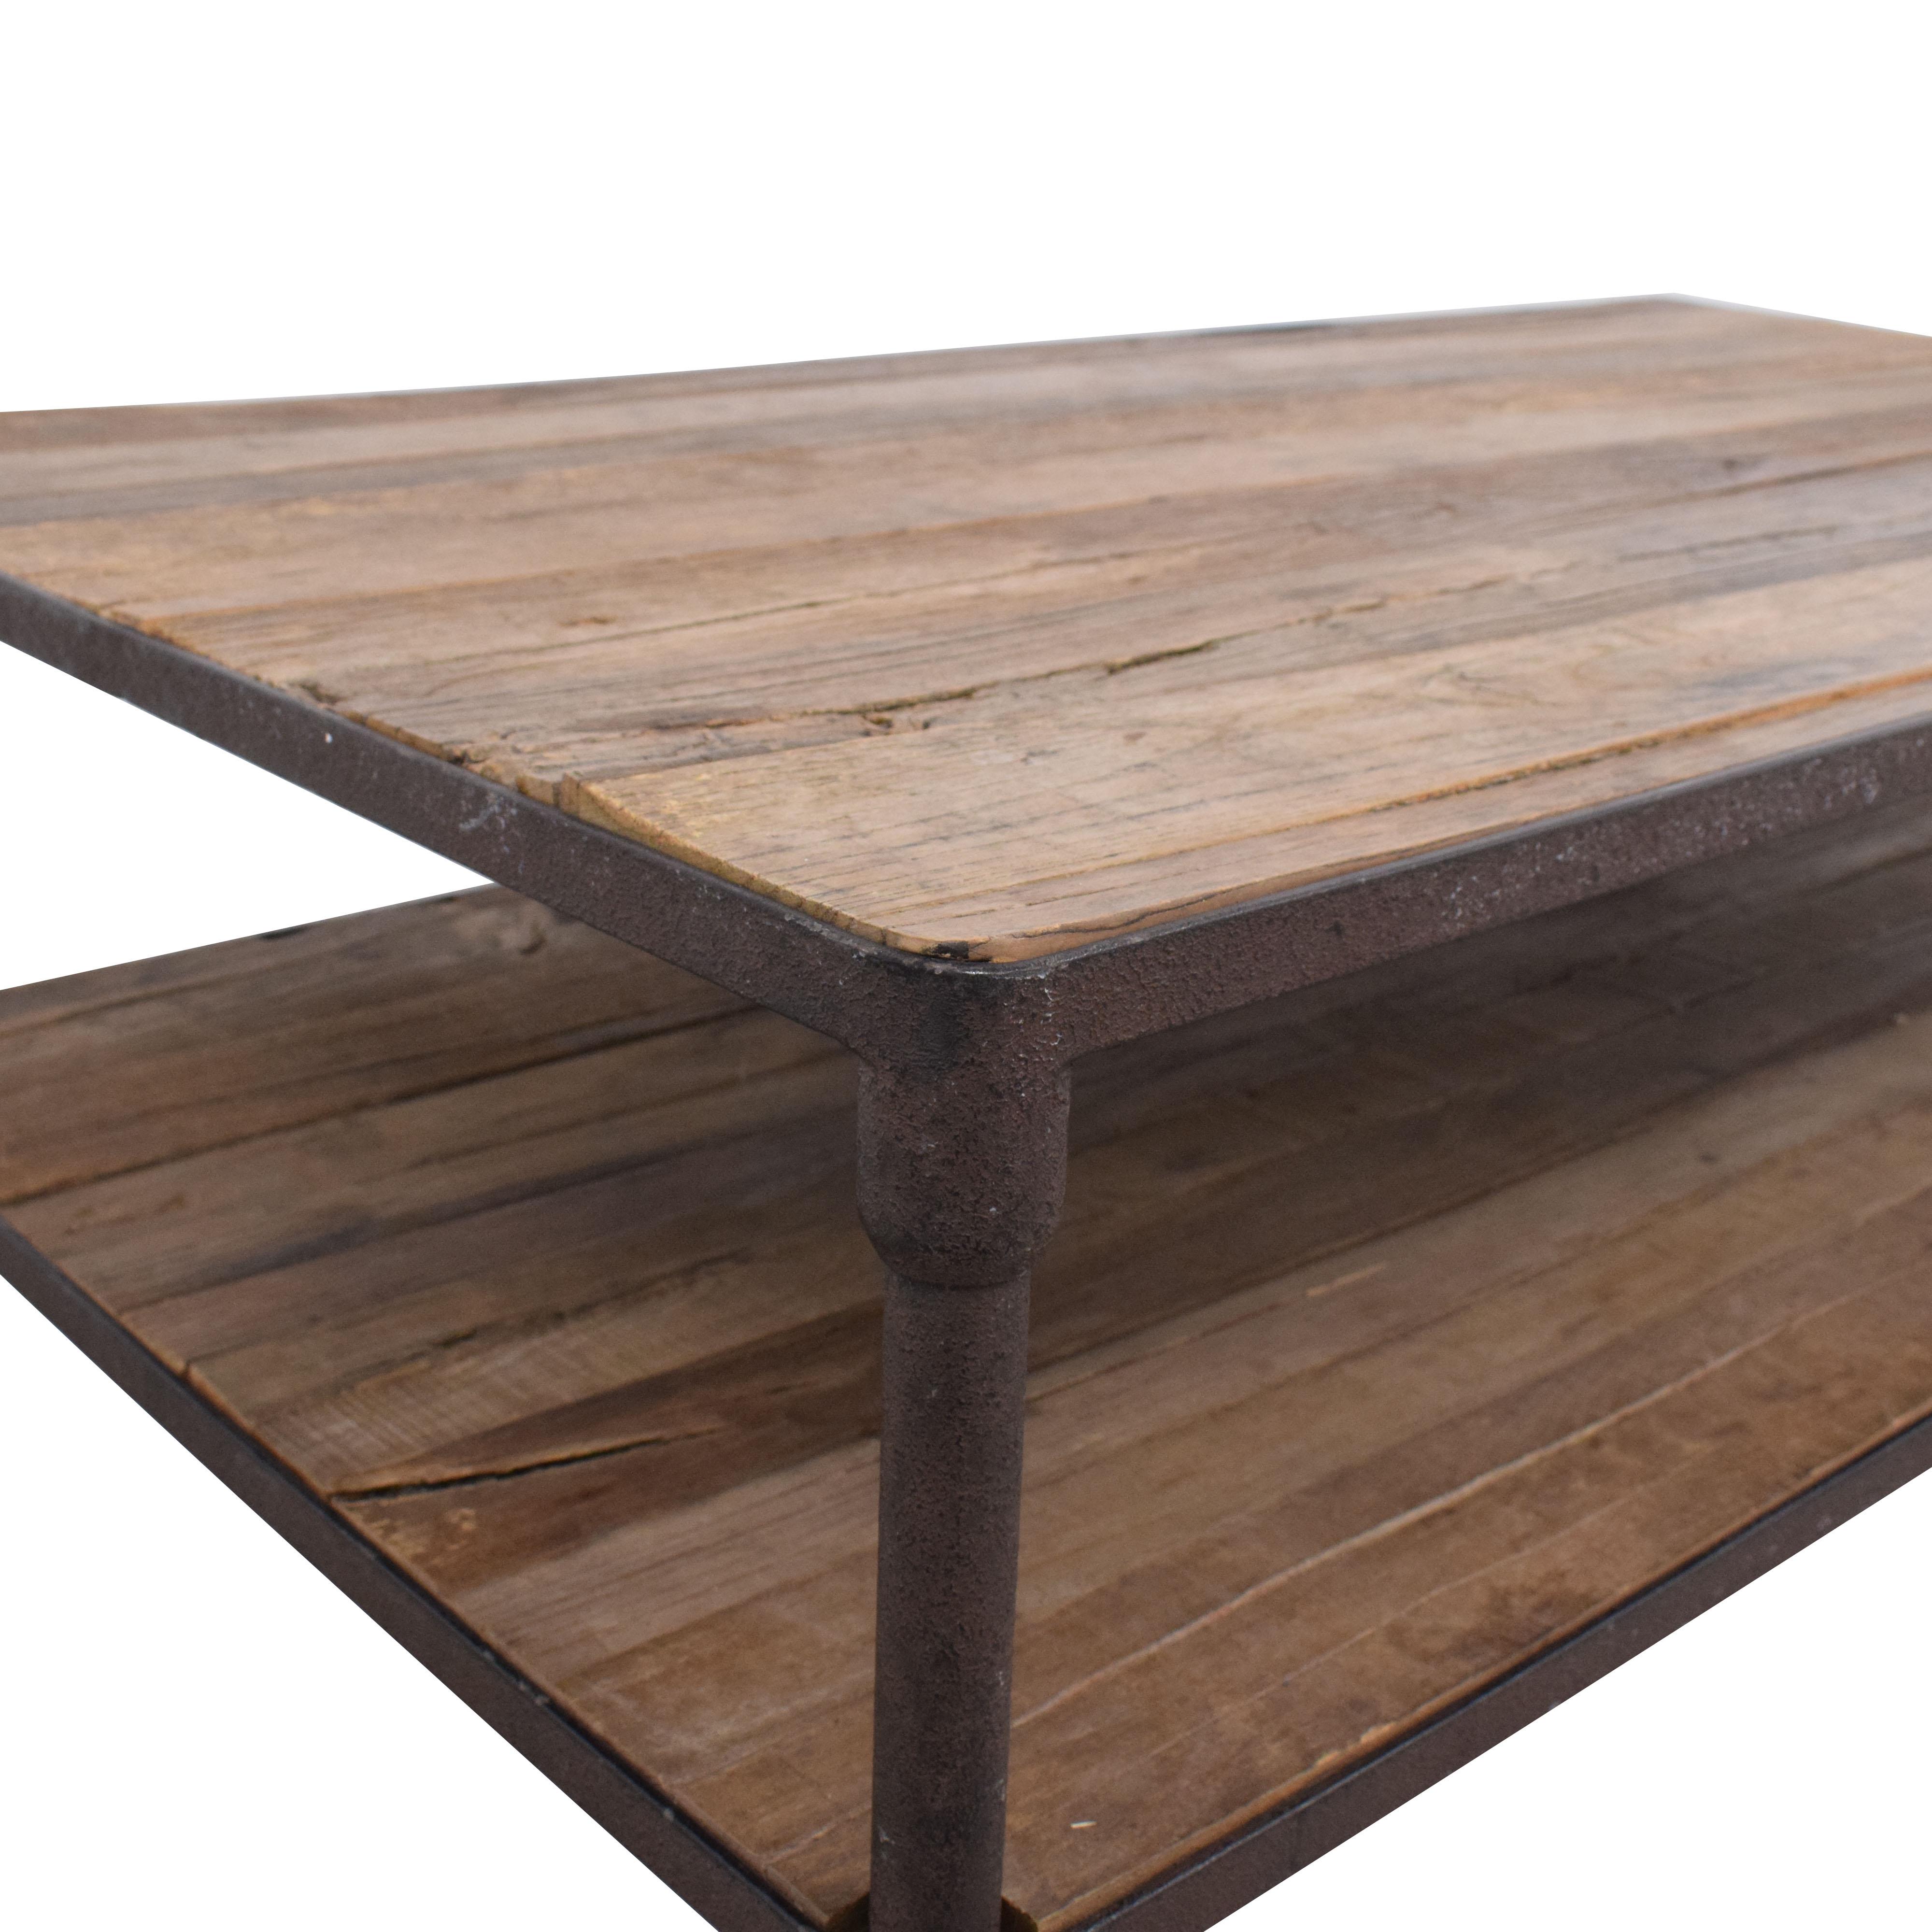 buy Restoration Hardware Restoration Hardware Dutch Industrial Coffee Table online